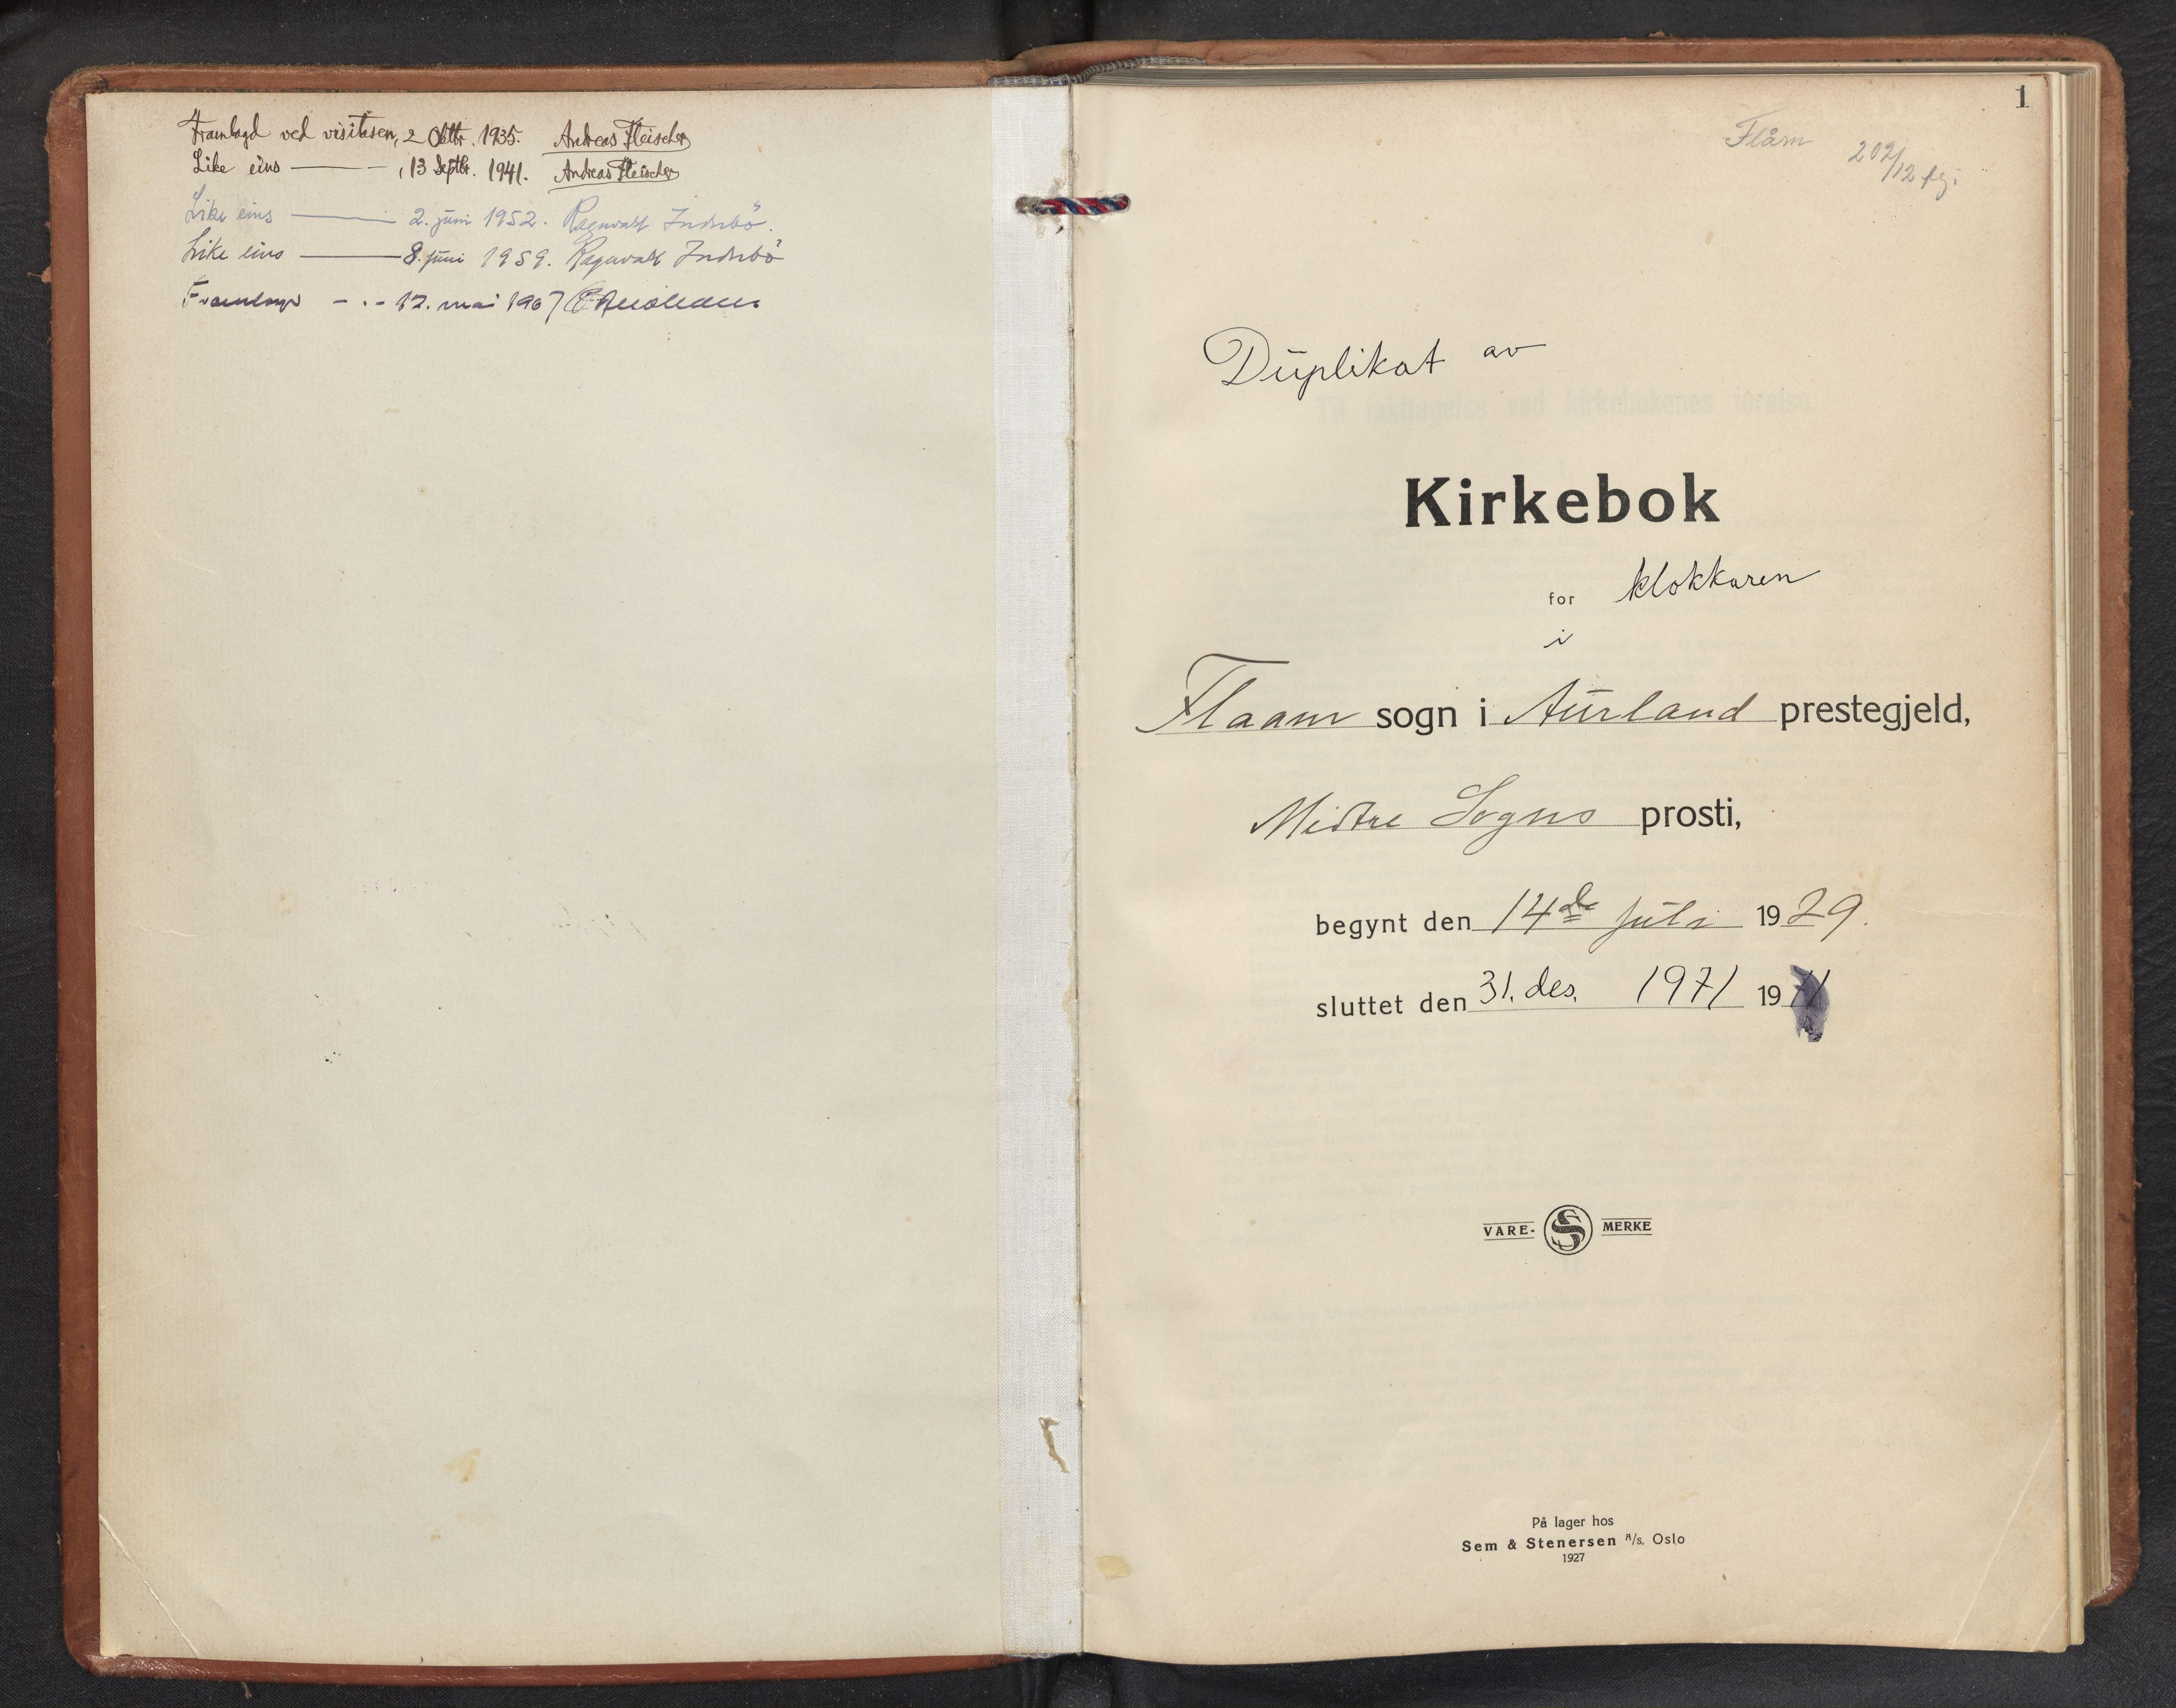 SAB, Aurland Sokneprestembete*, Klokkerbok nr. B 3, 1929-1972, s. 0b-1a